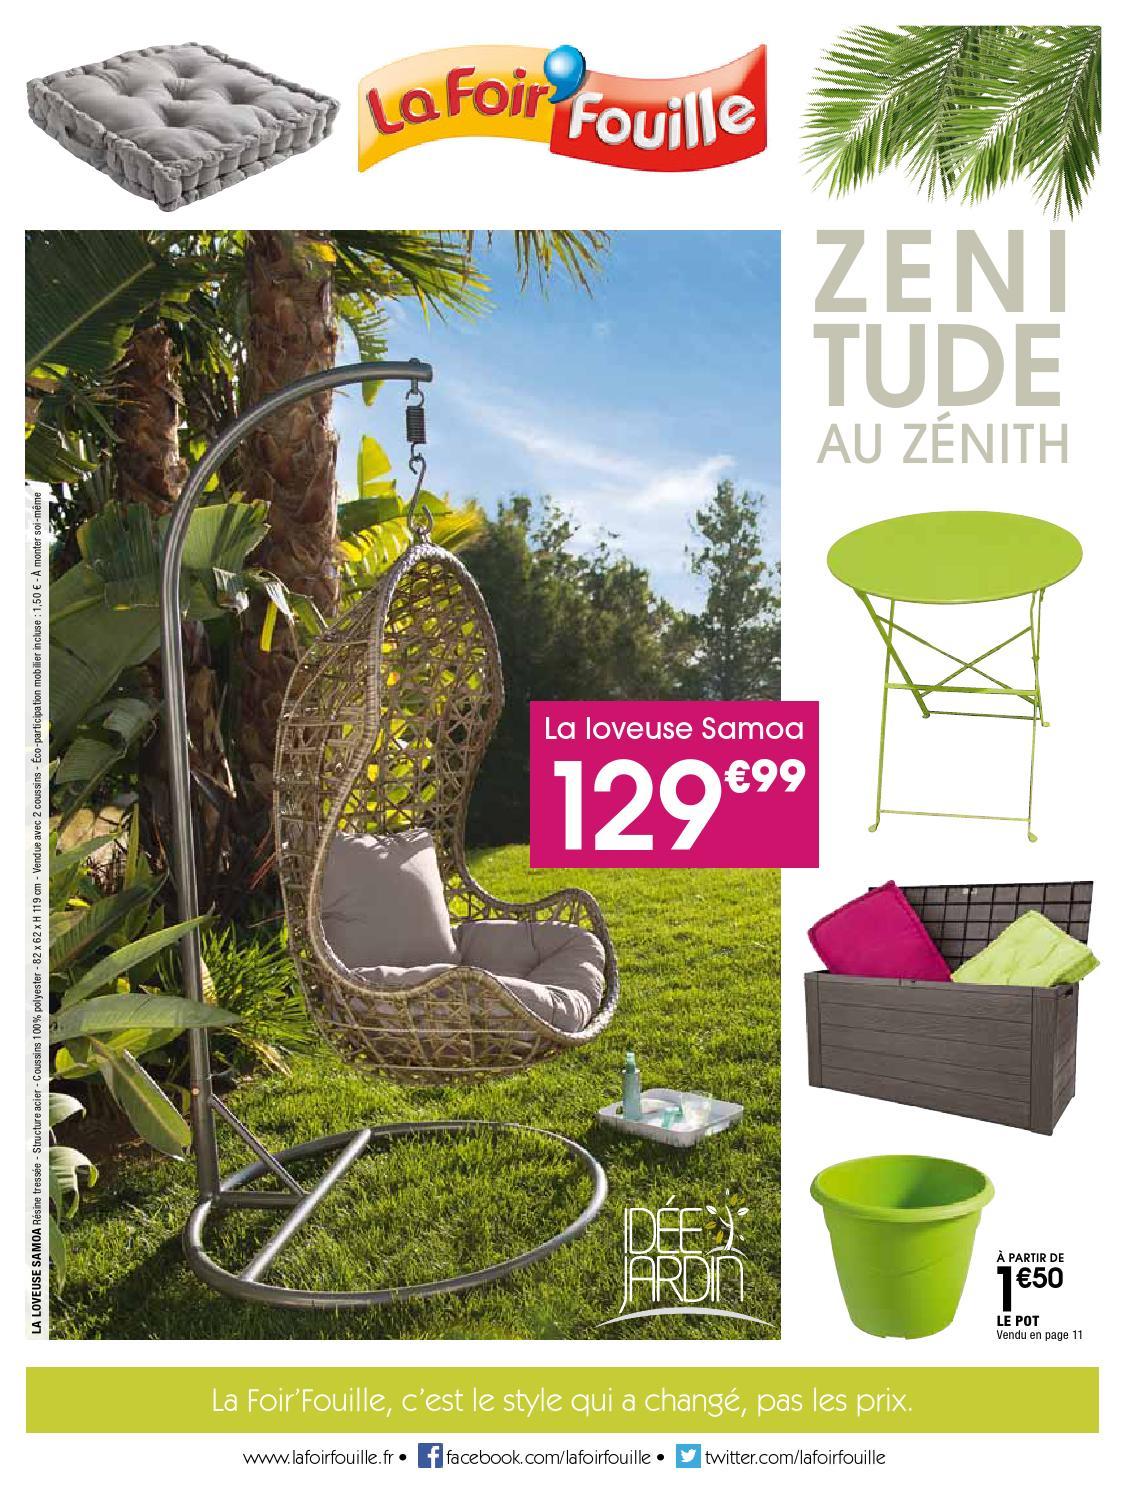 Catalogue La Foir Fouille - Zenitude Au Zénith By Joe Monroe ... concernant Salon De Jardin La Foir Fouille